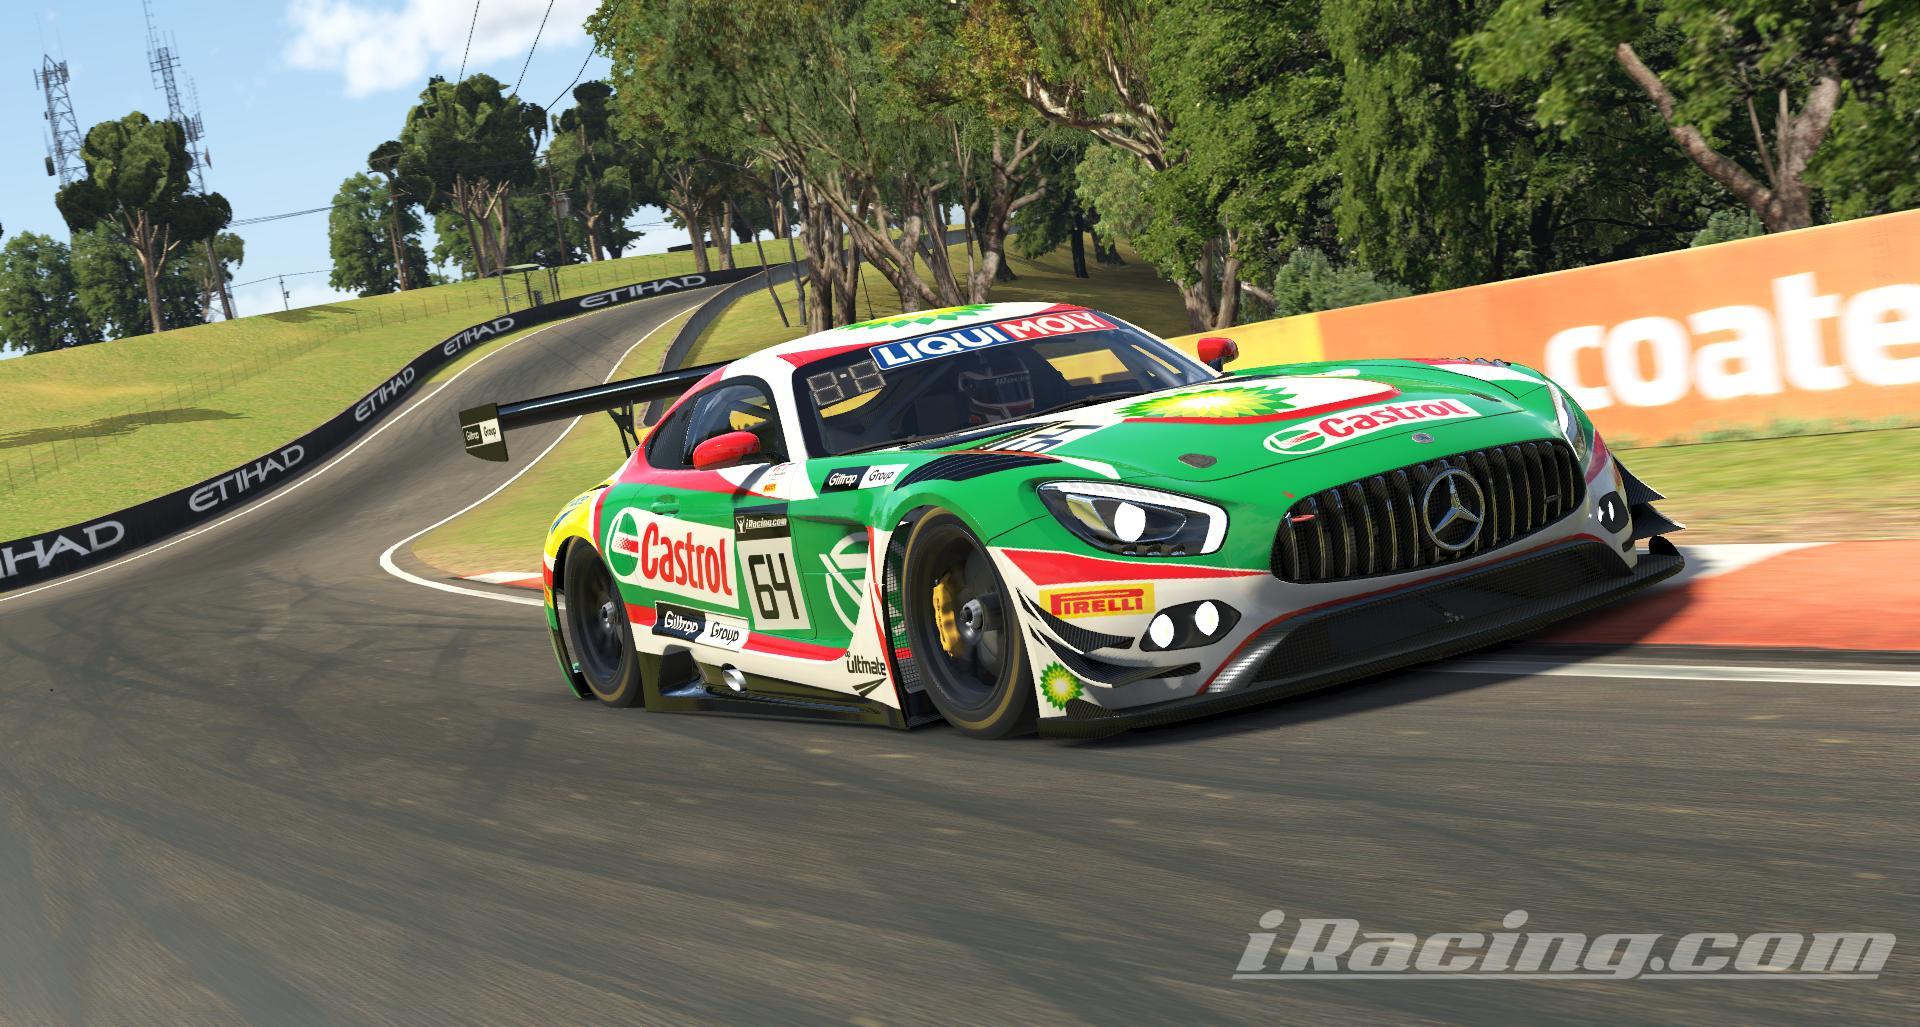 Preview of 2020 R Motorsport Bathurst 12 Hour by Kazuhiro Oida